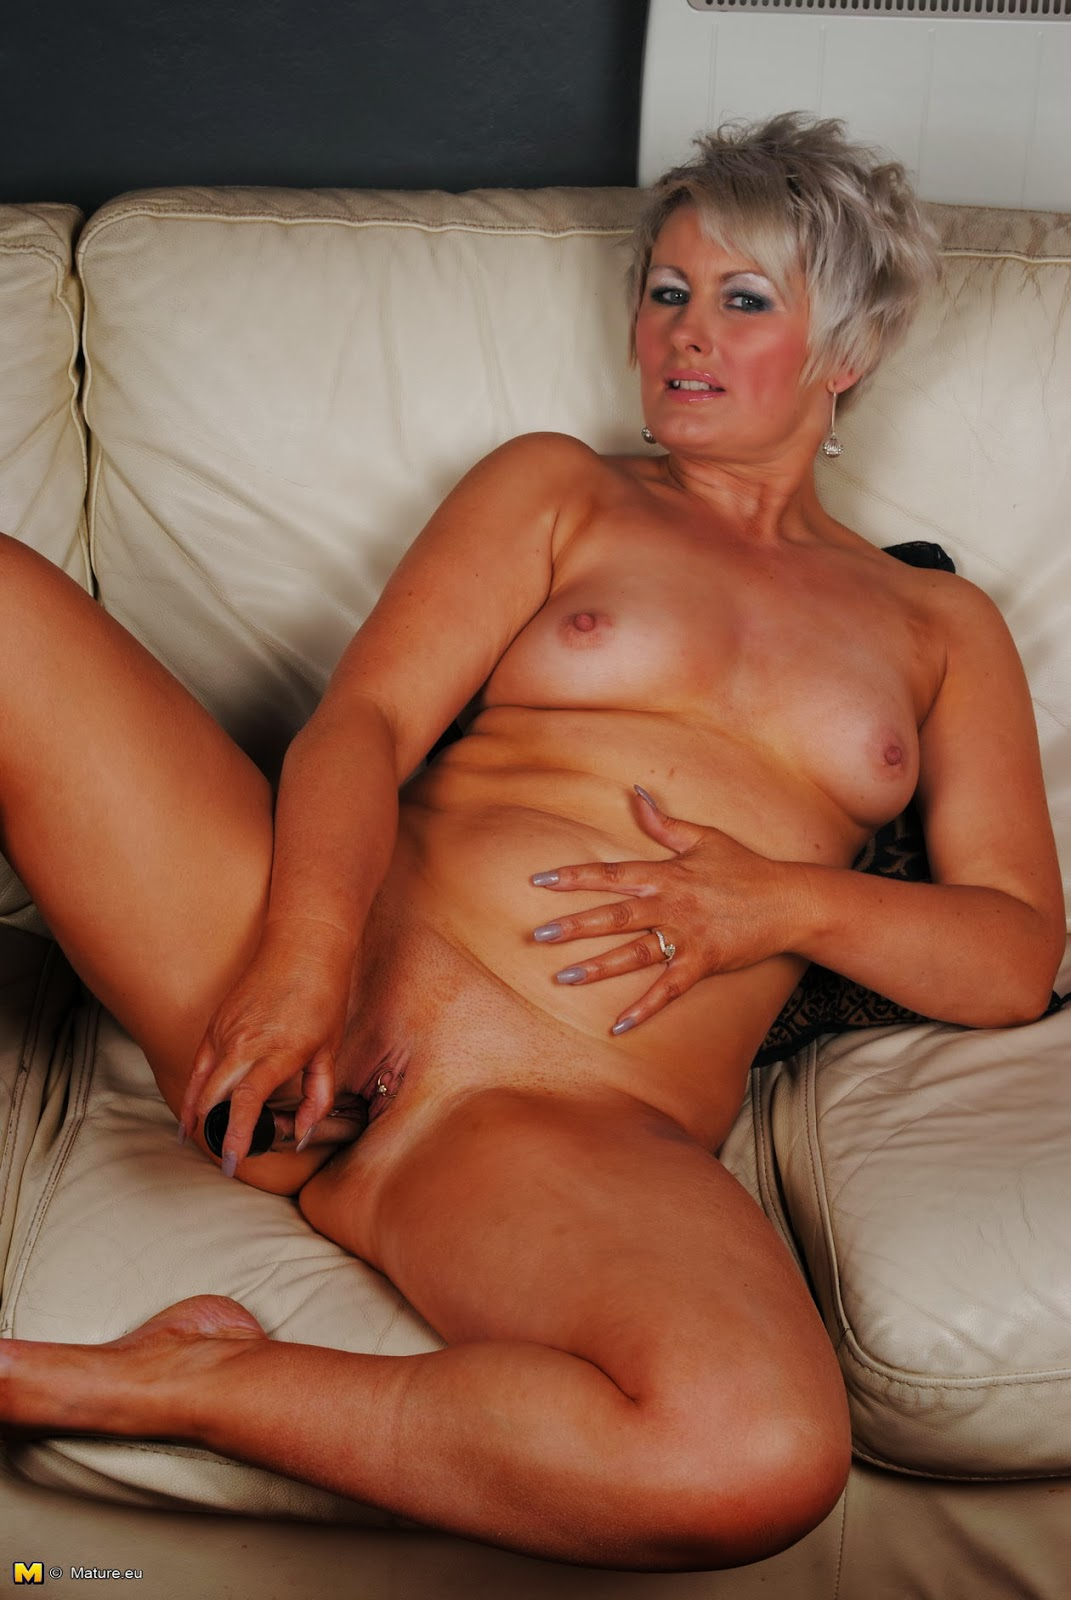 Older Women Archive  Blogspot  Com Davina Pics-3376